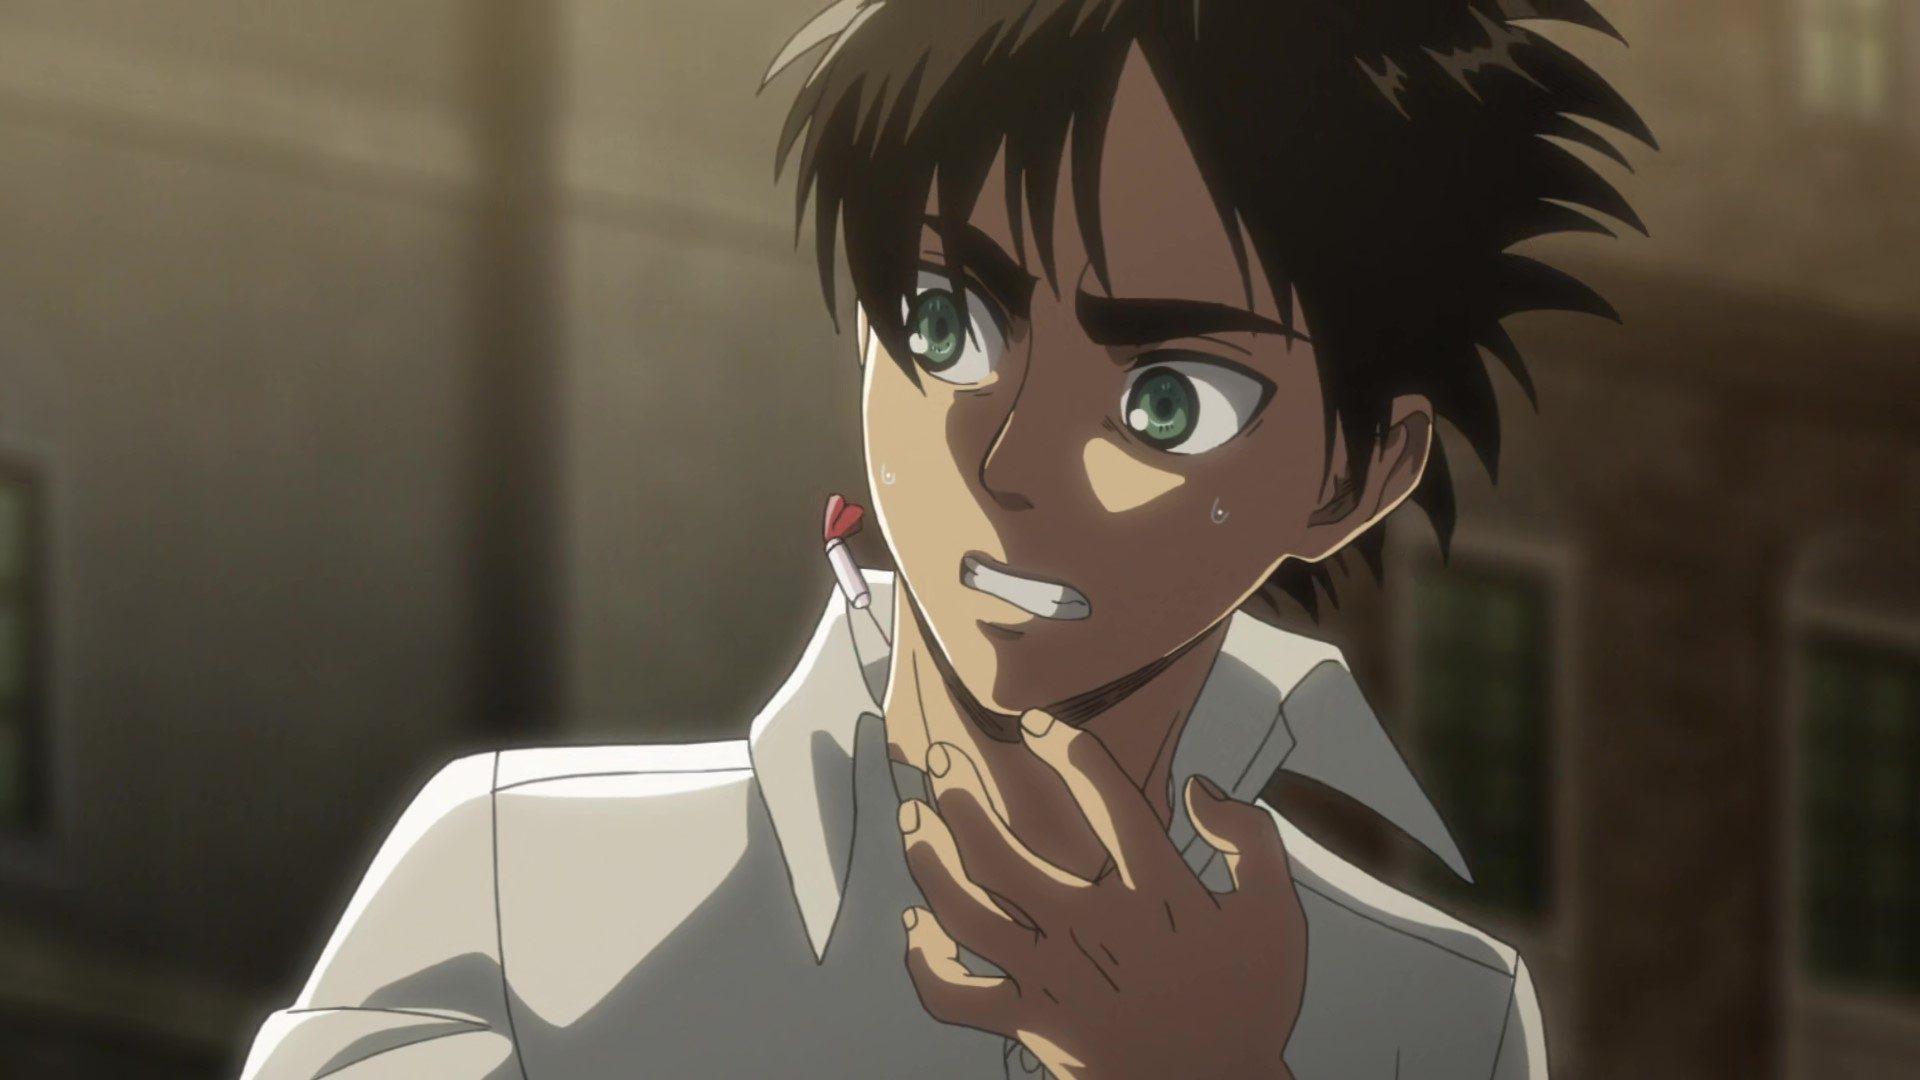 Attack on Titan Season 3 Episode 2 English Dubbed - AnimeGT